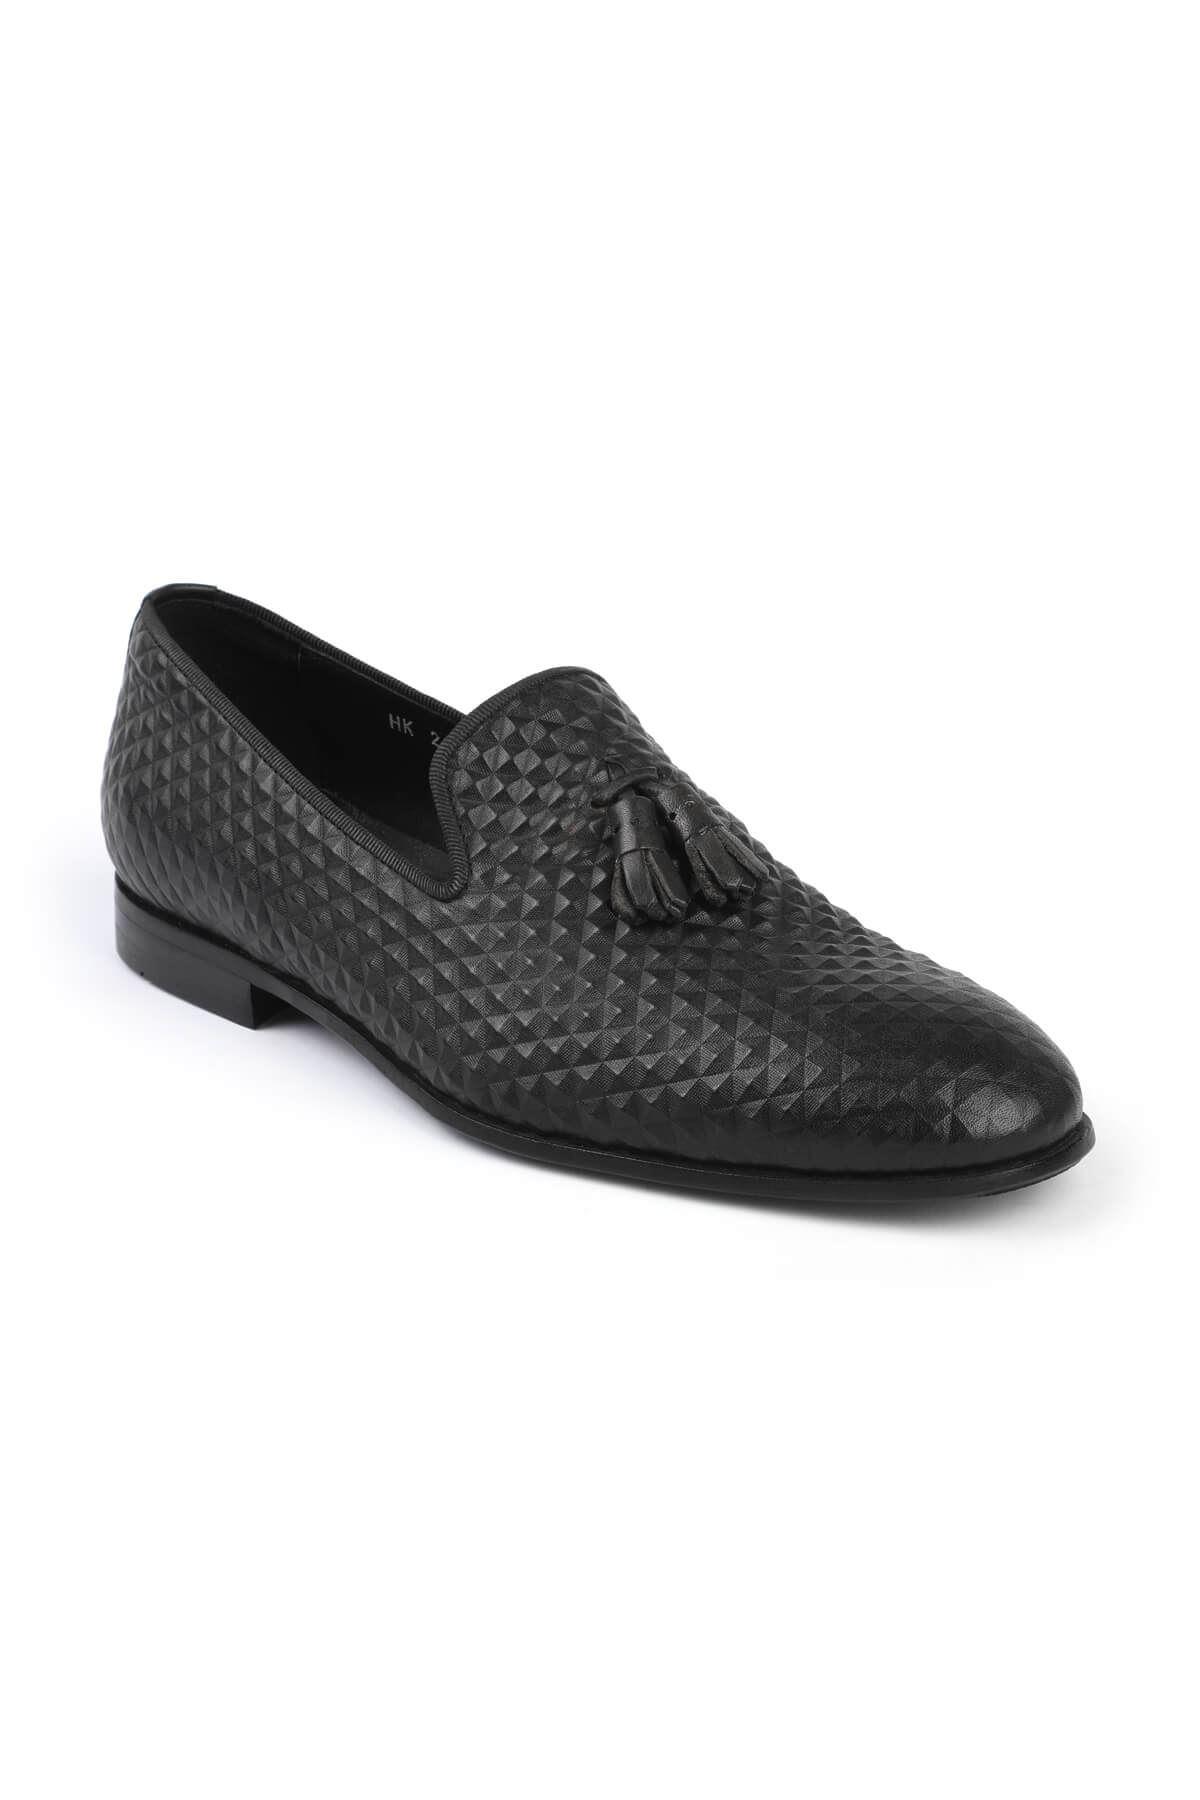 Libero 2830 Black Loafer Shoes